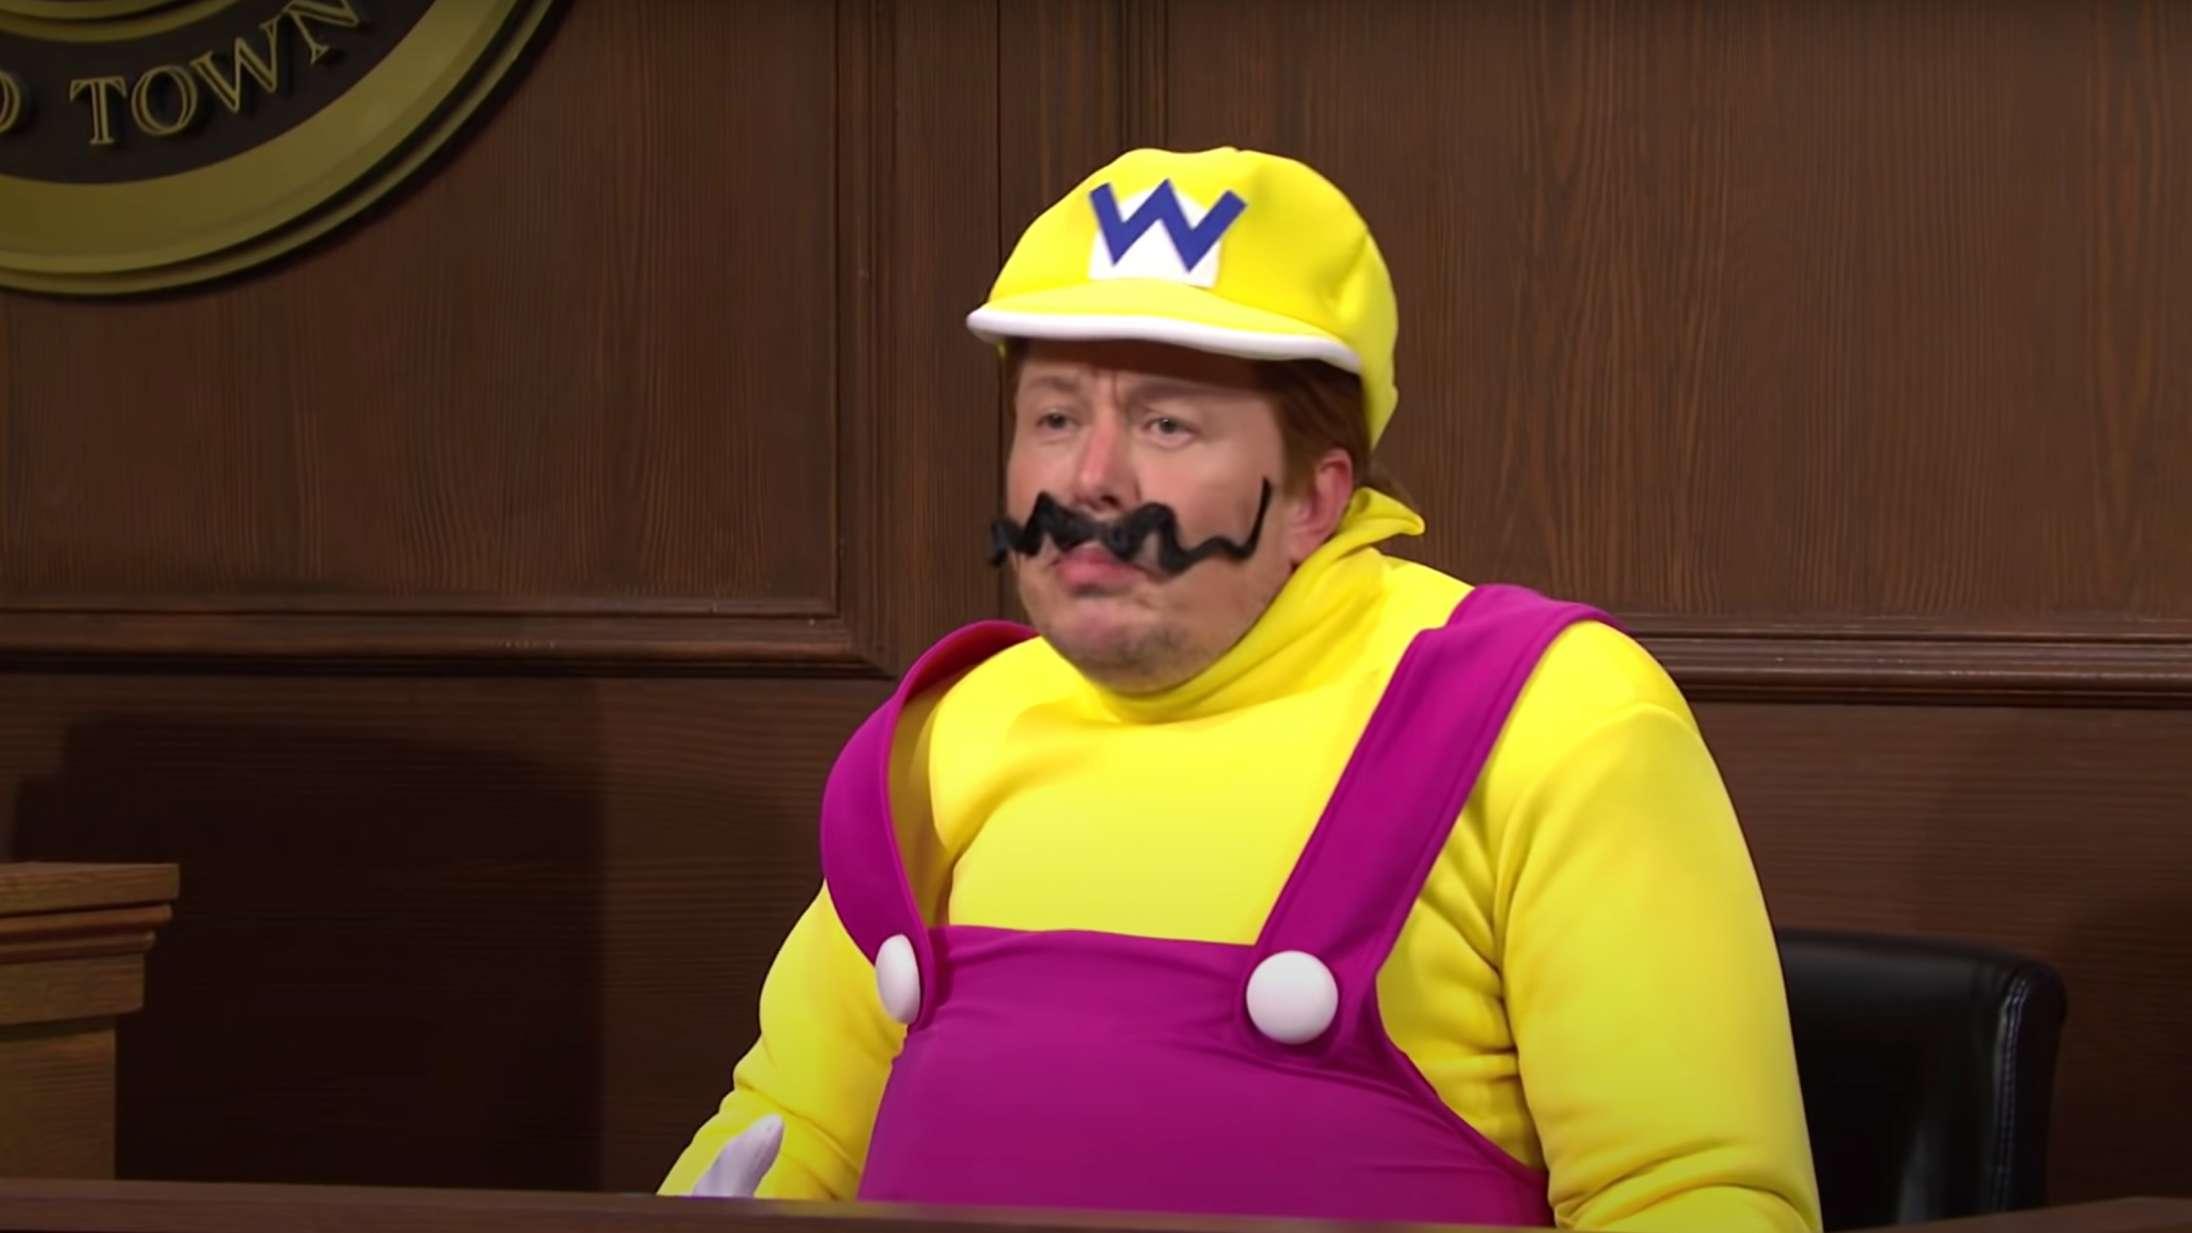 Wario anklages for mord, og Luigi sender dick pics i 'SNL'-sketch med Elon Musk